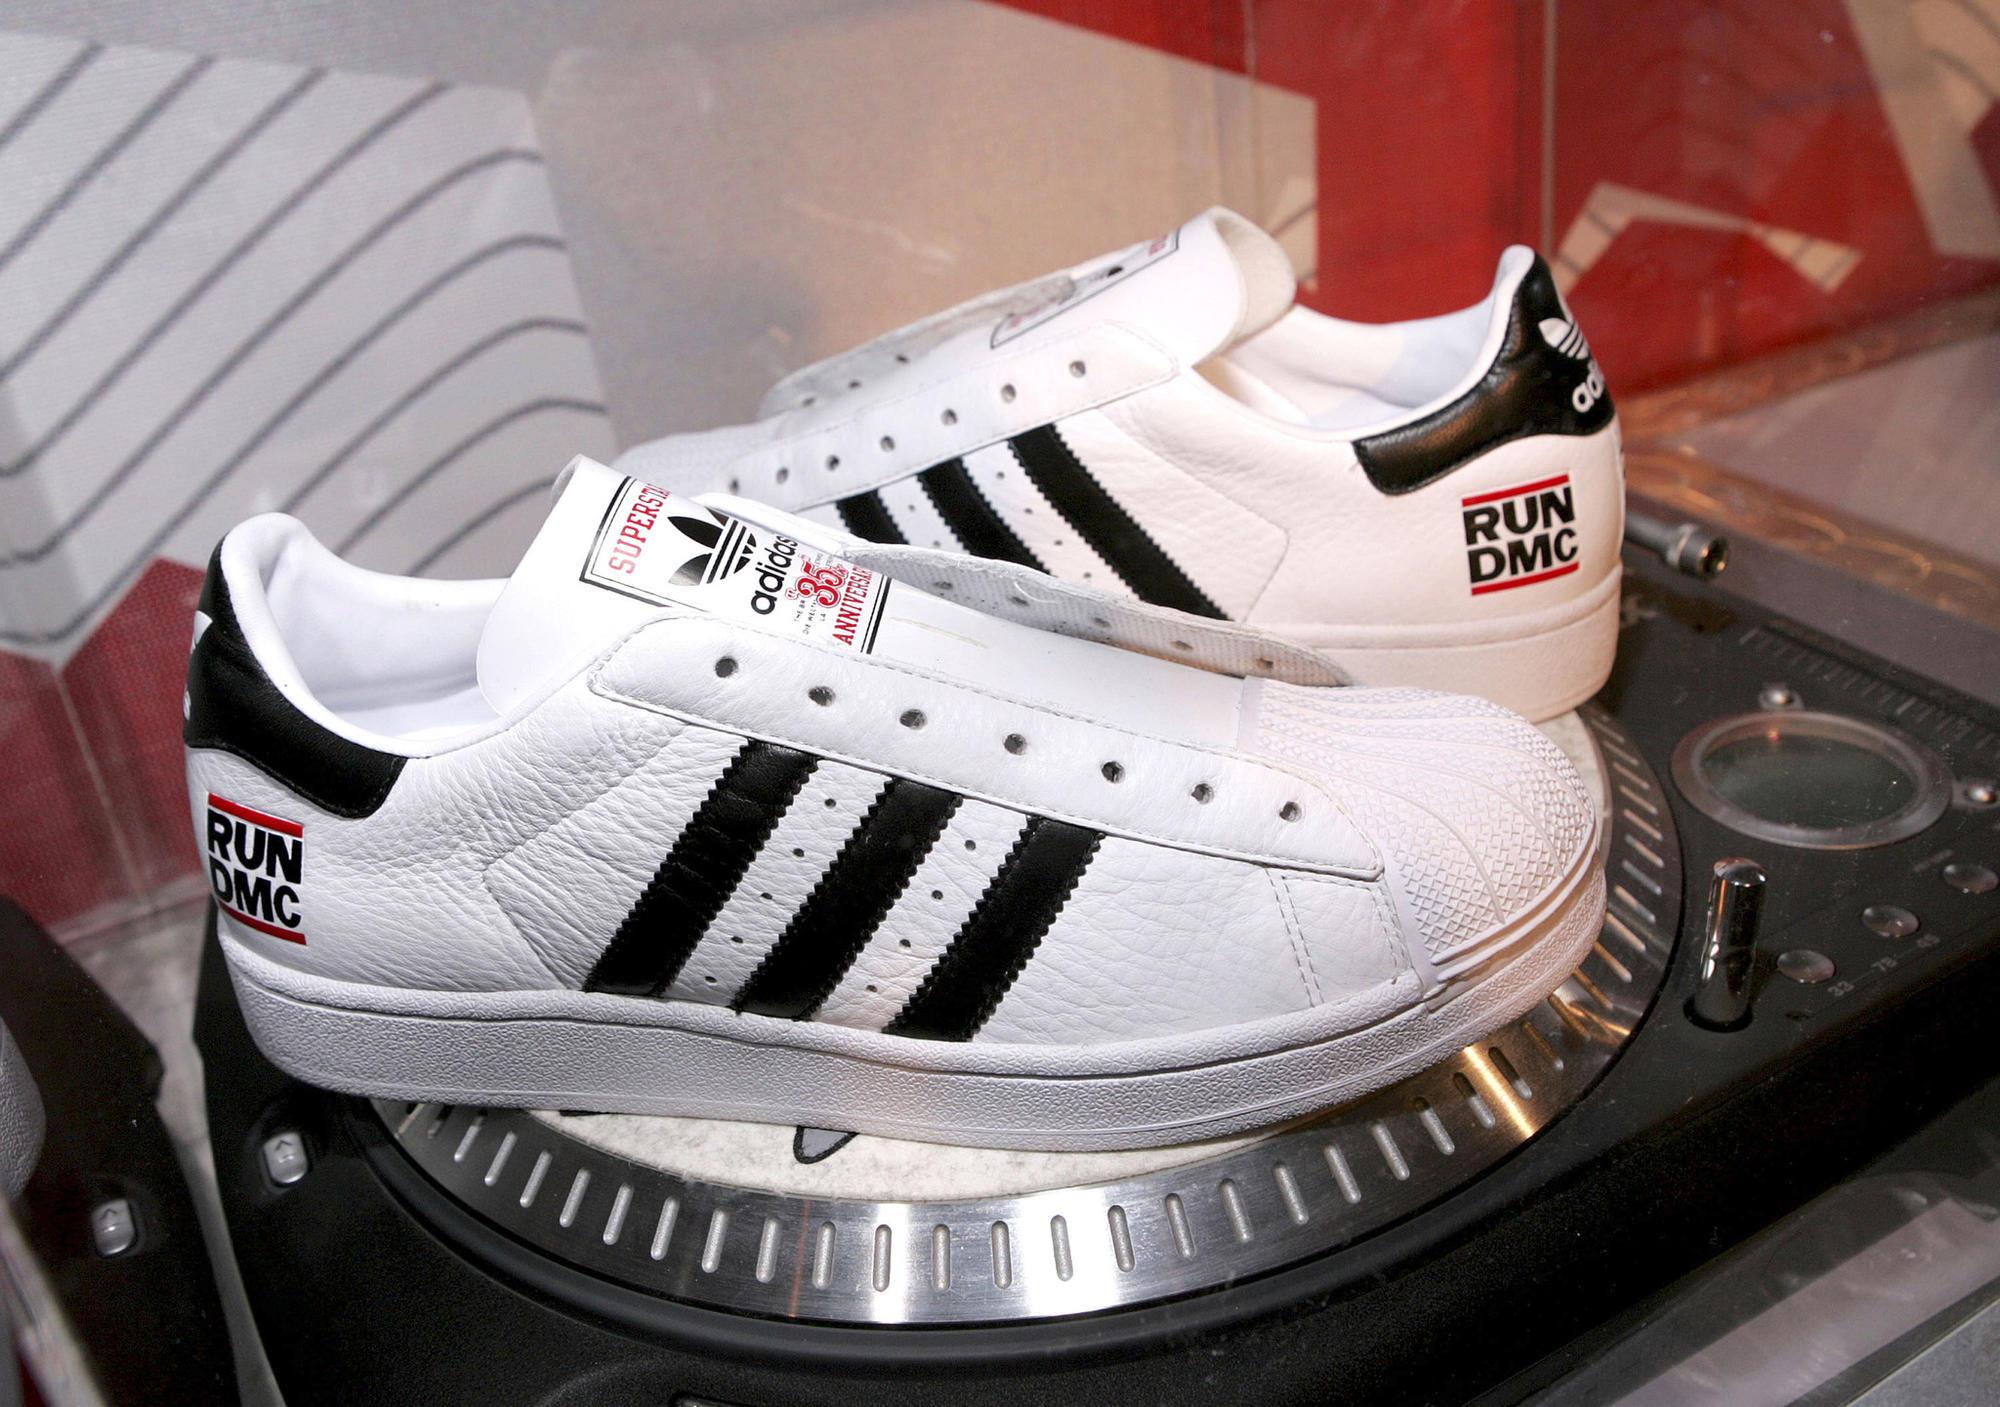 35th Anniversary Run-DMC Adidas Superstar